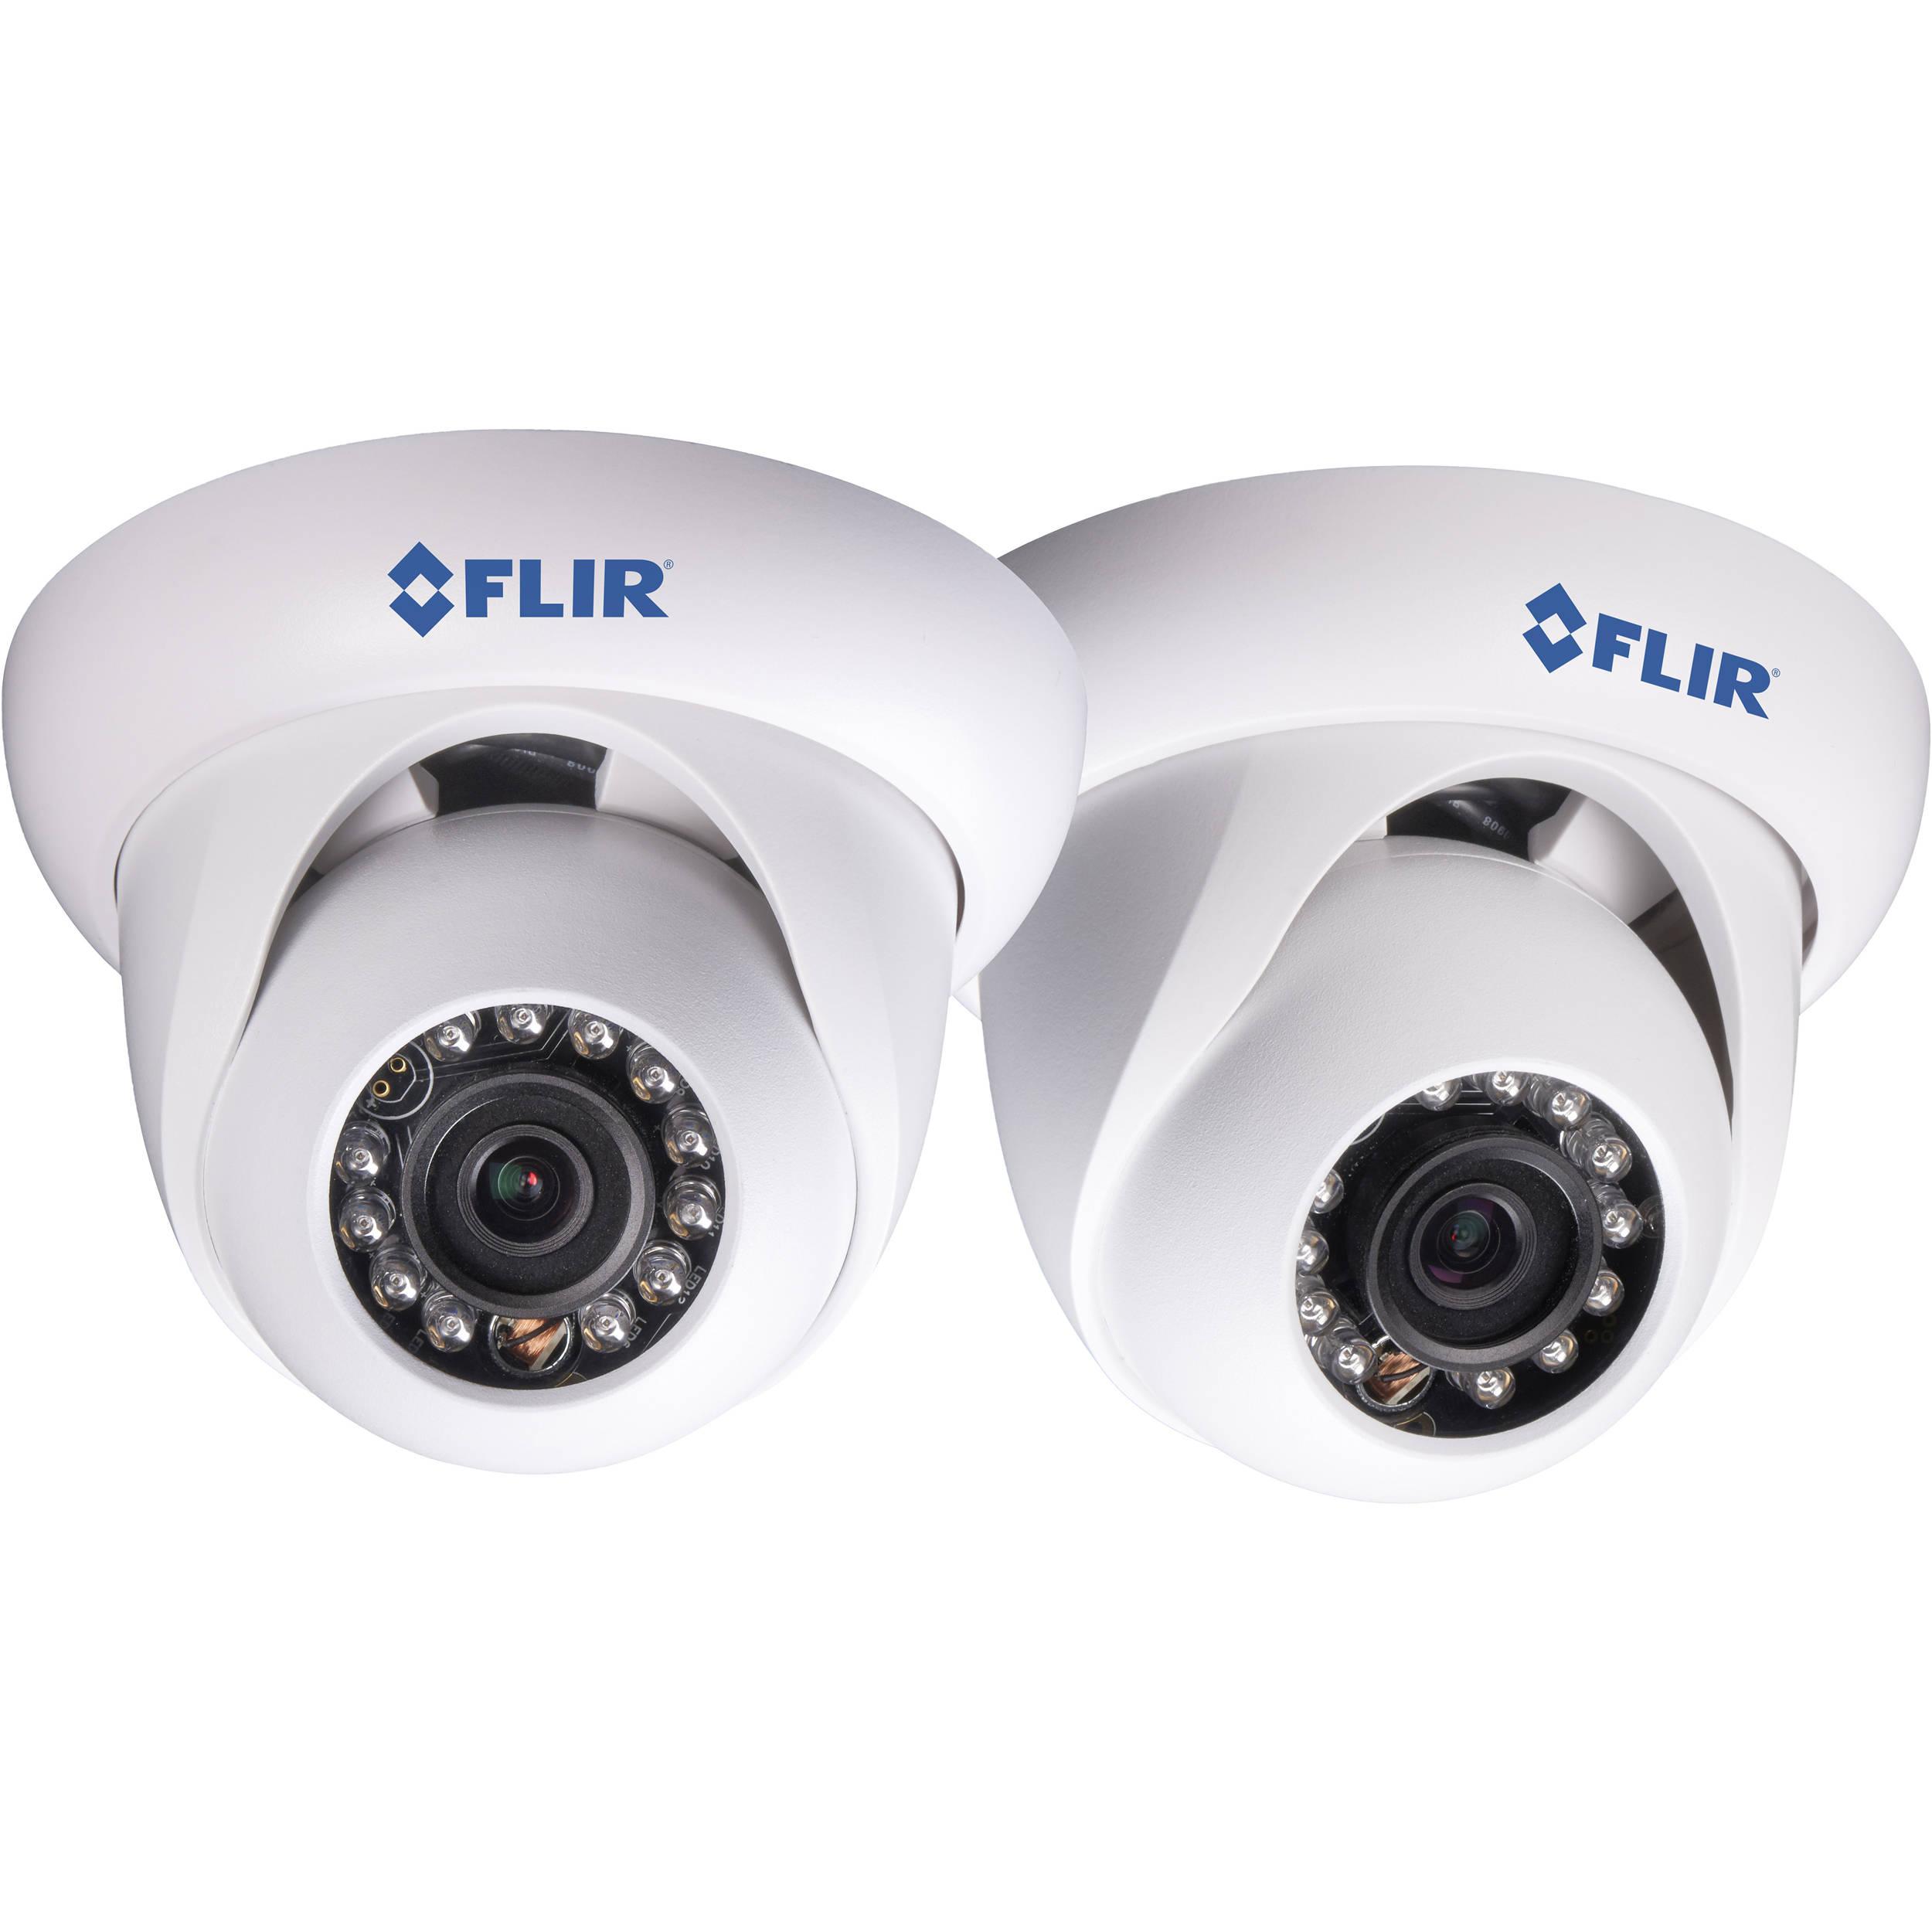 FLIR 2.1MP IR Dome IP Camera with 3.6mm Fixed Lens DNE12TL22 B&H